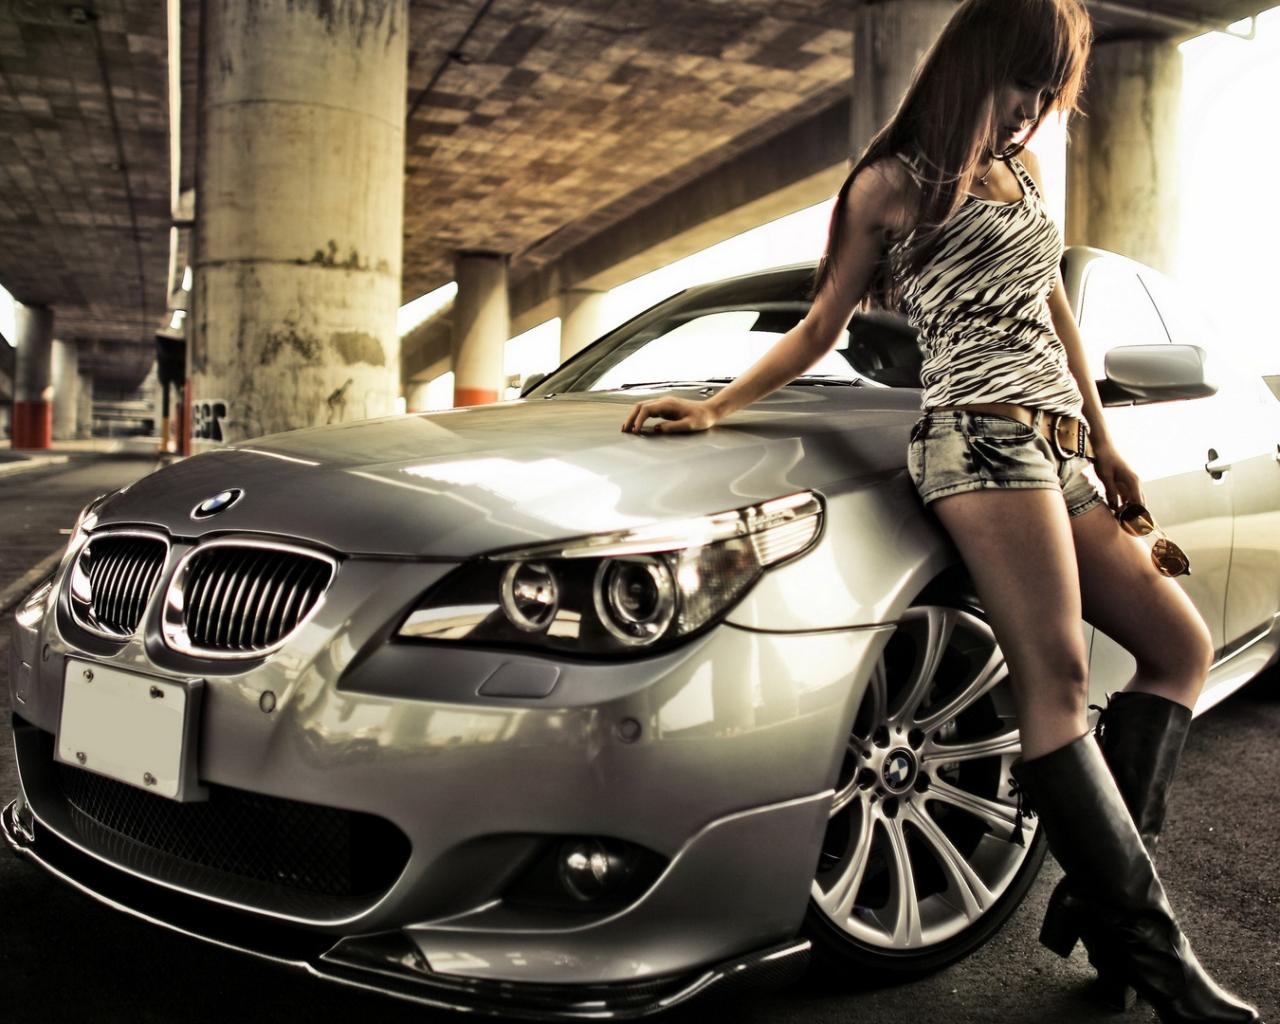 http://hq-wallpapers.ru/wallpapers/10/hq-wallpapers_ru_cars_46516_1280x1024.jpg